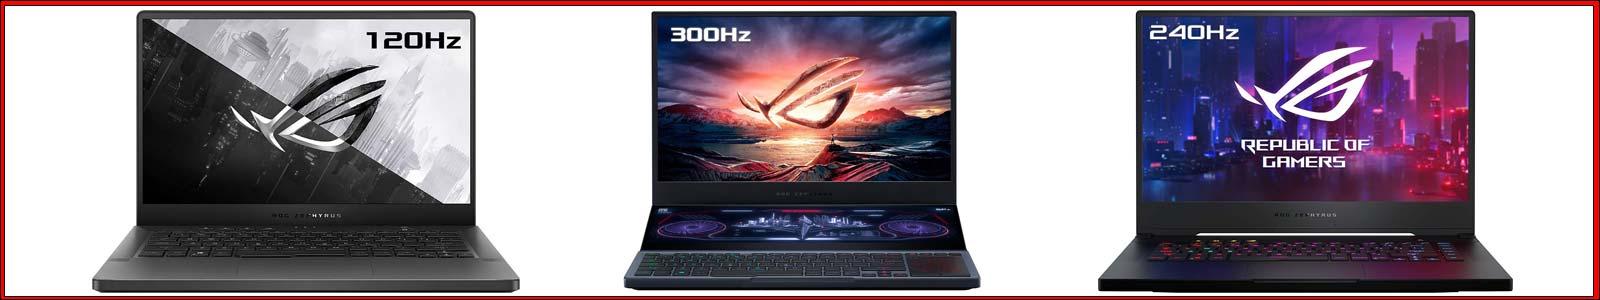 portatil gaming asus rog zephyrus precios comprar comparativa